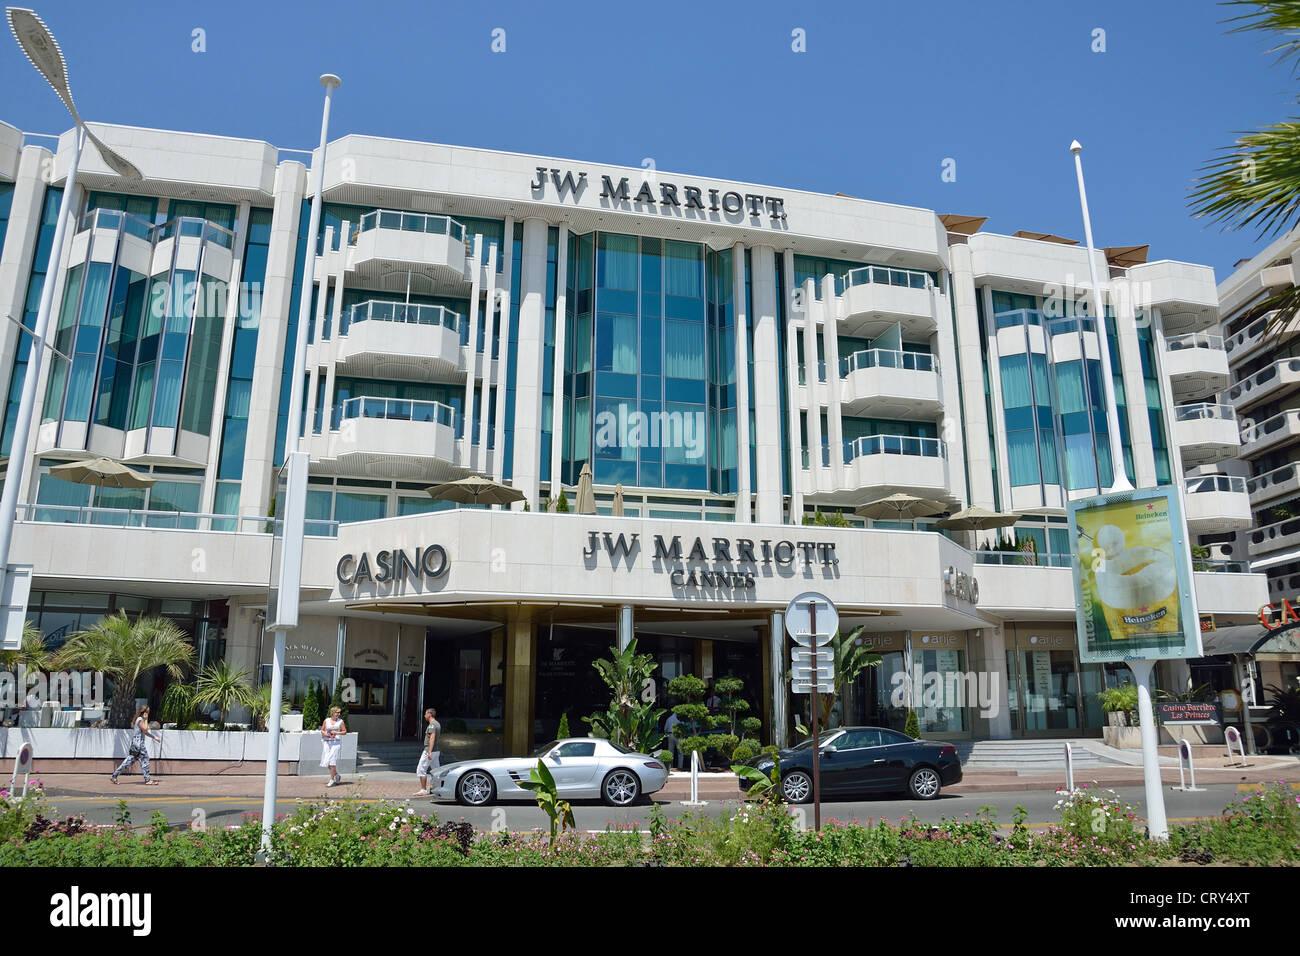 Hotel De Provence Cannes